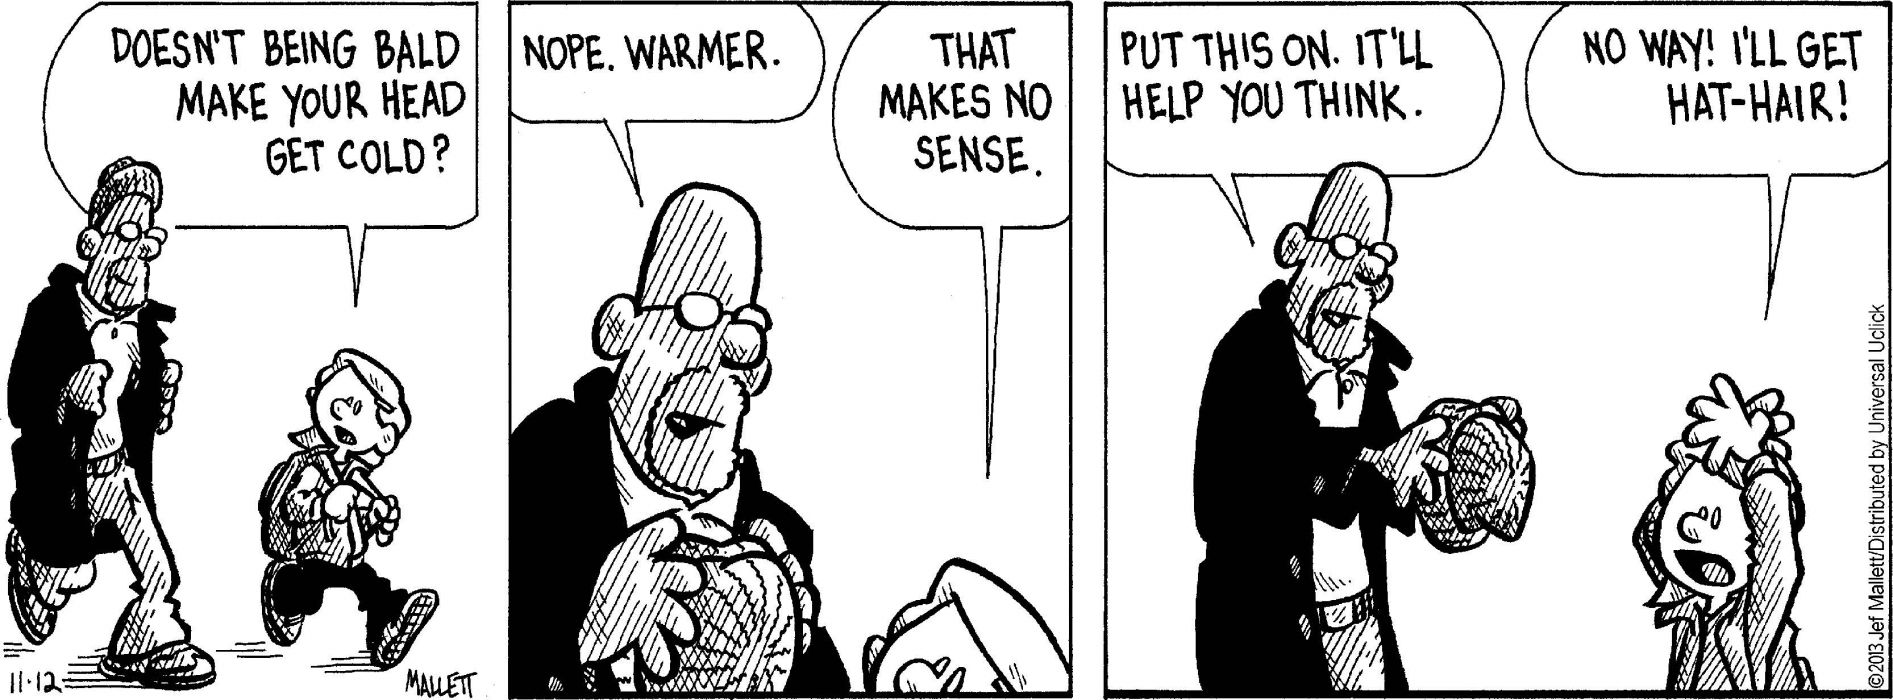 FRAZZ comicstrip humor funny comic (30) wallpaper